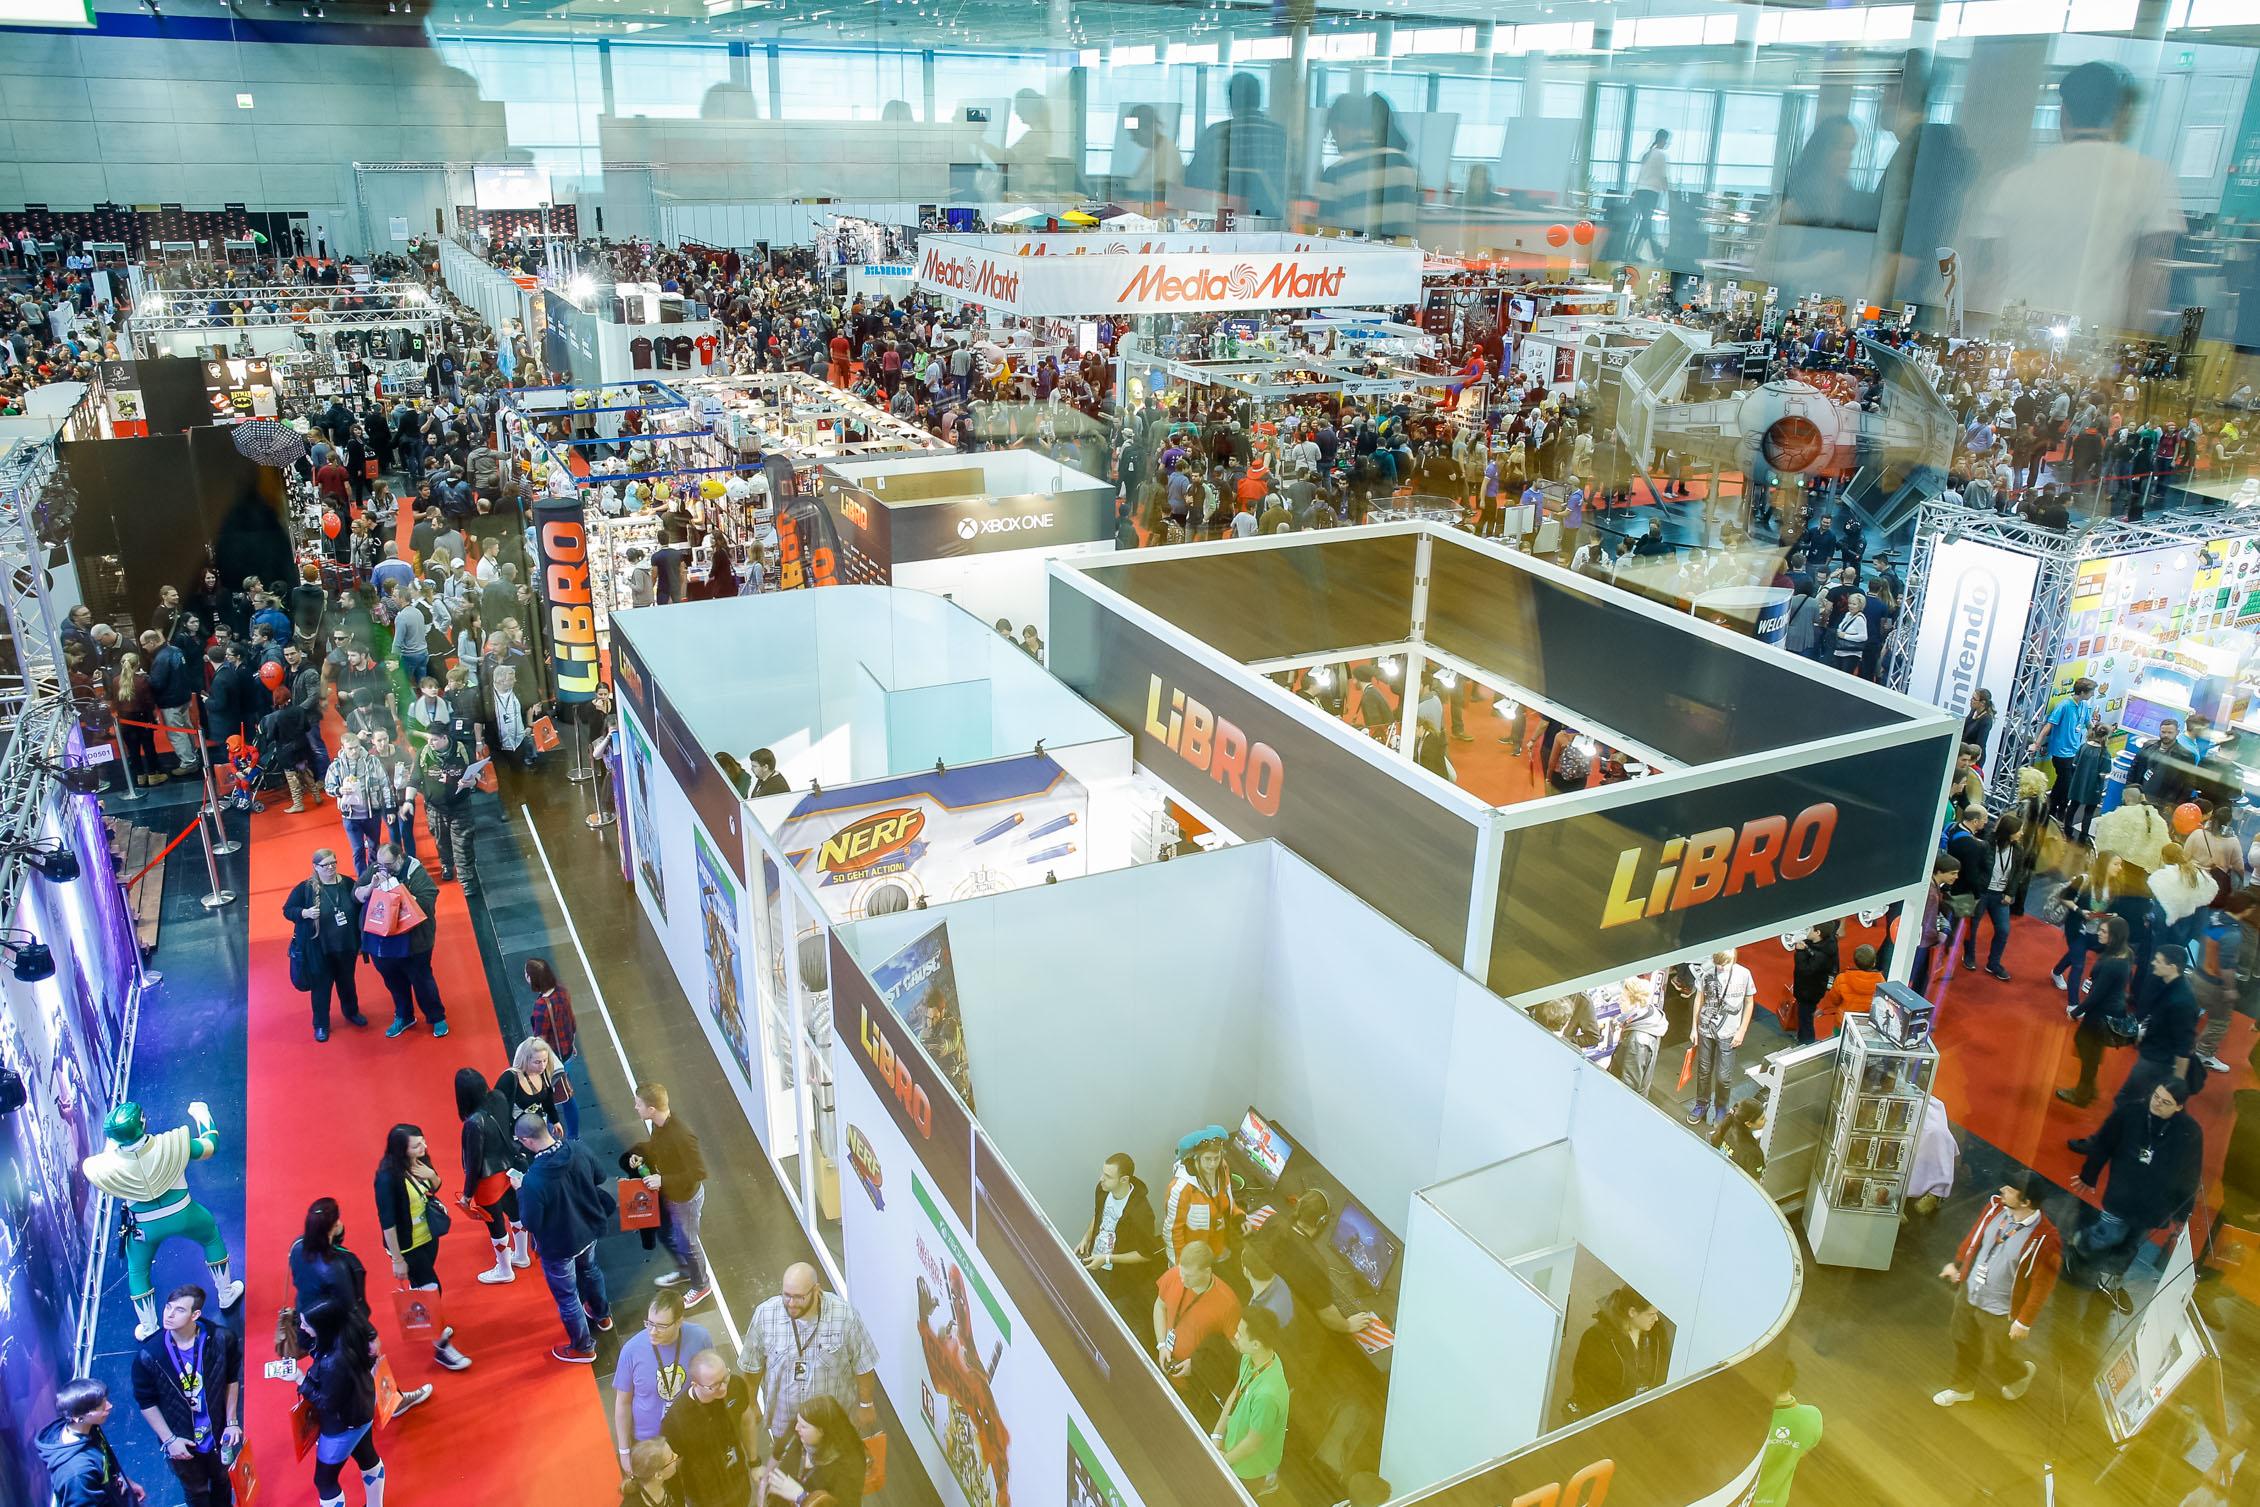 Libro Vienna Comic Con, Brandland by KOOP Live Marketing Messen in Wien